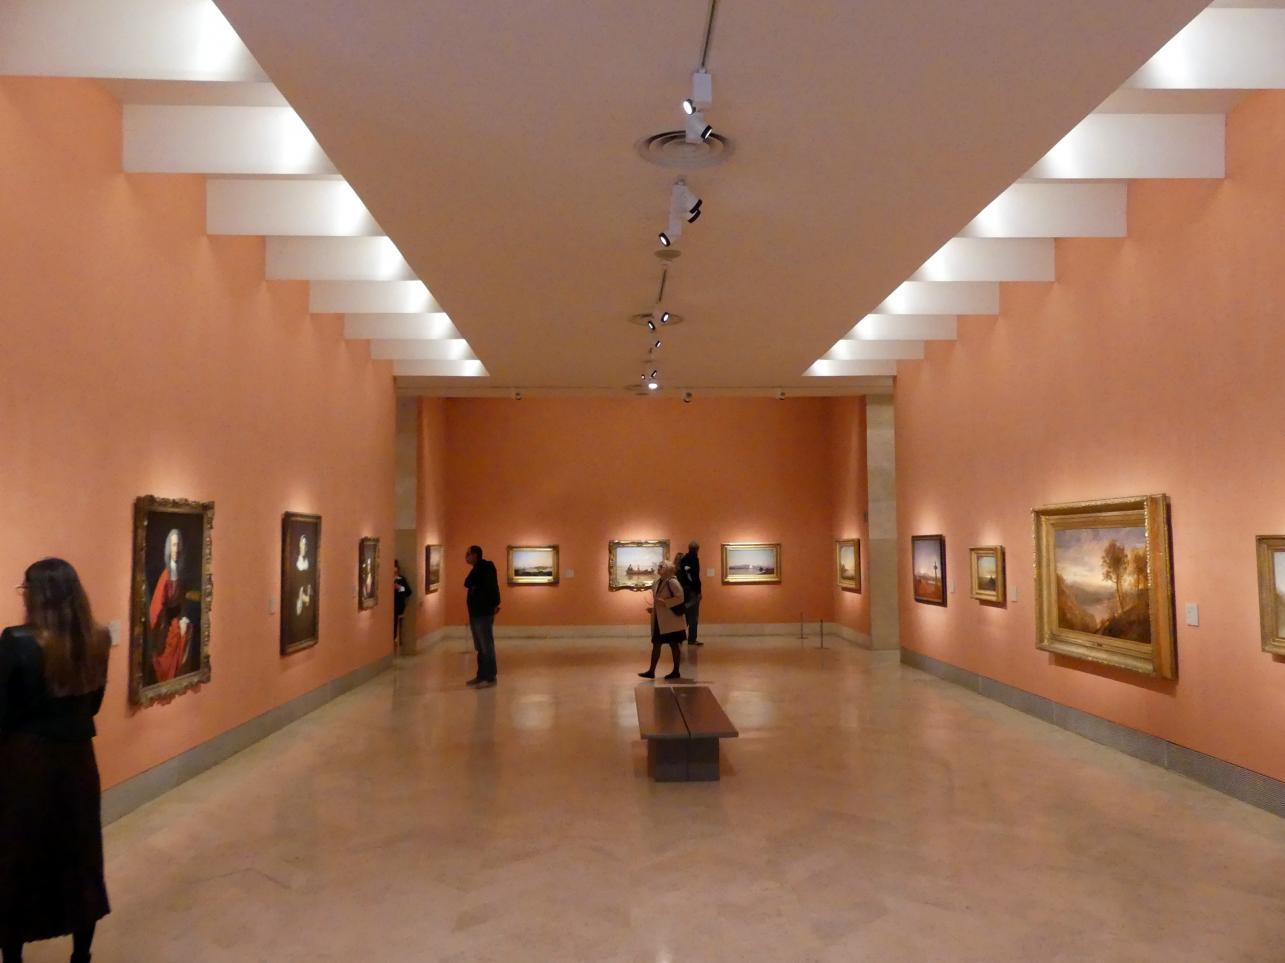 Madrid, Museo Thyssen-Bornemisza, Saal 29, nordamerikanische Malerei des 19. Jahrhunderts